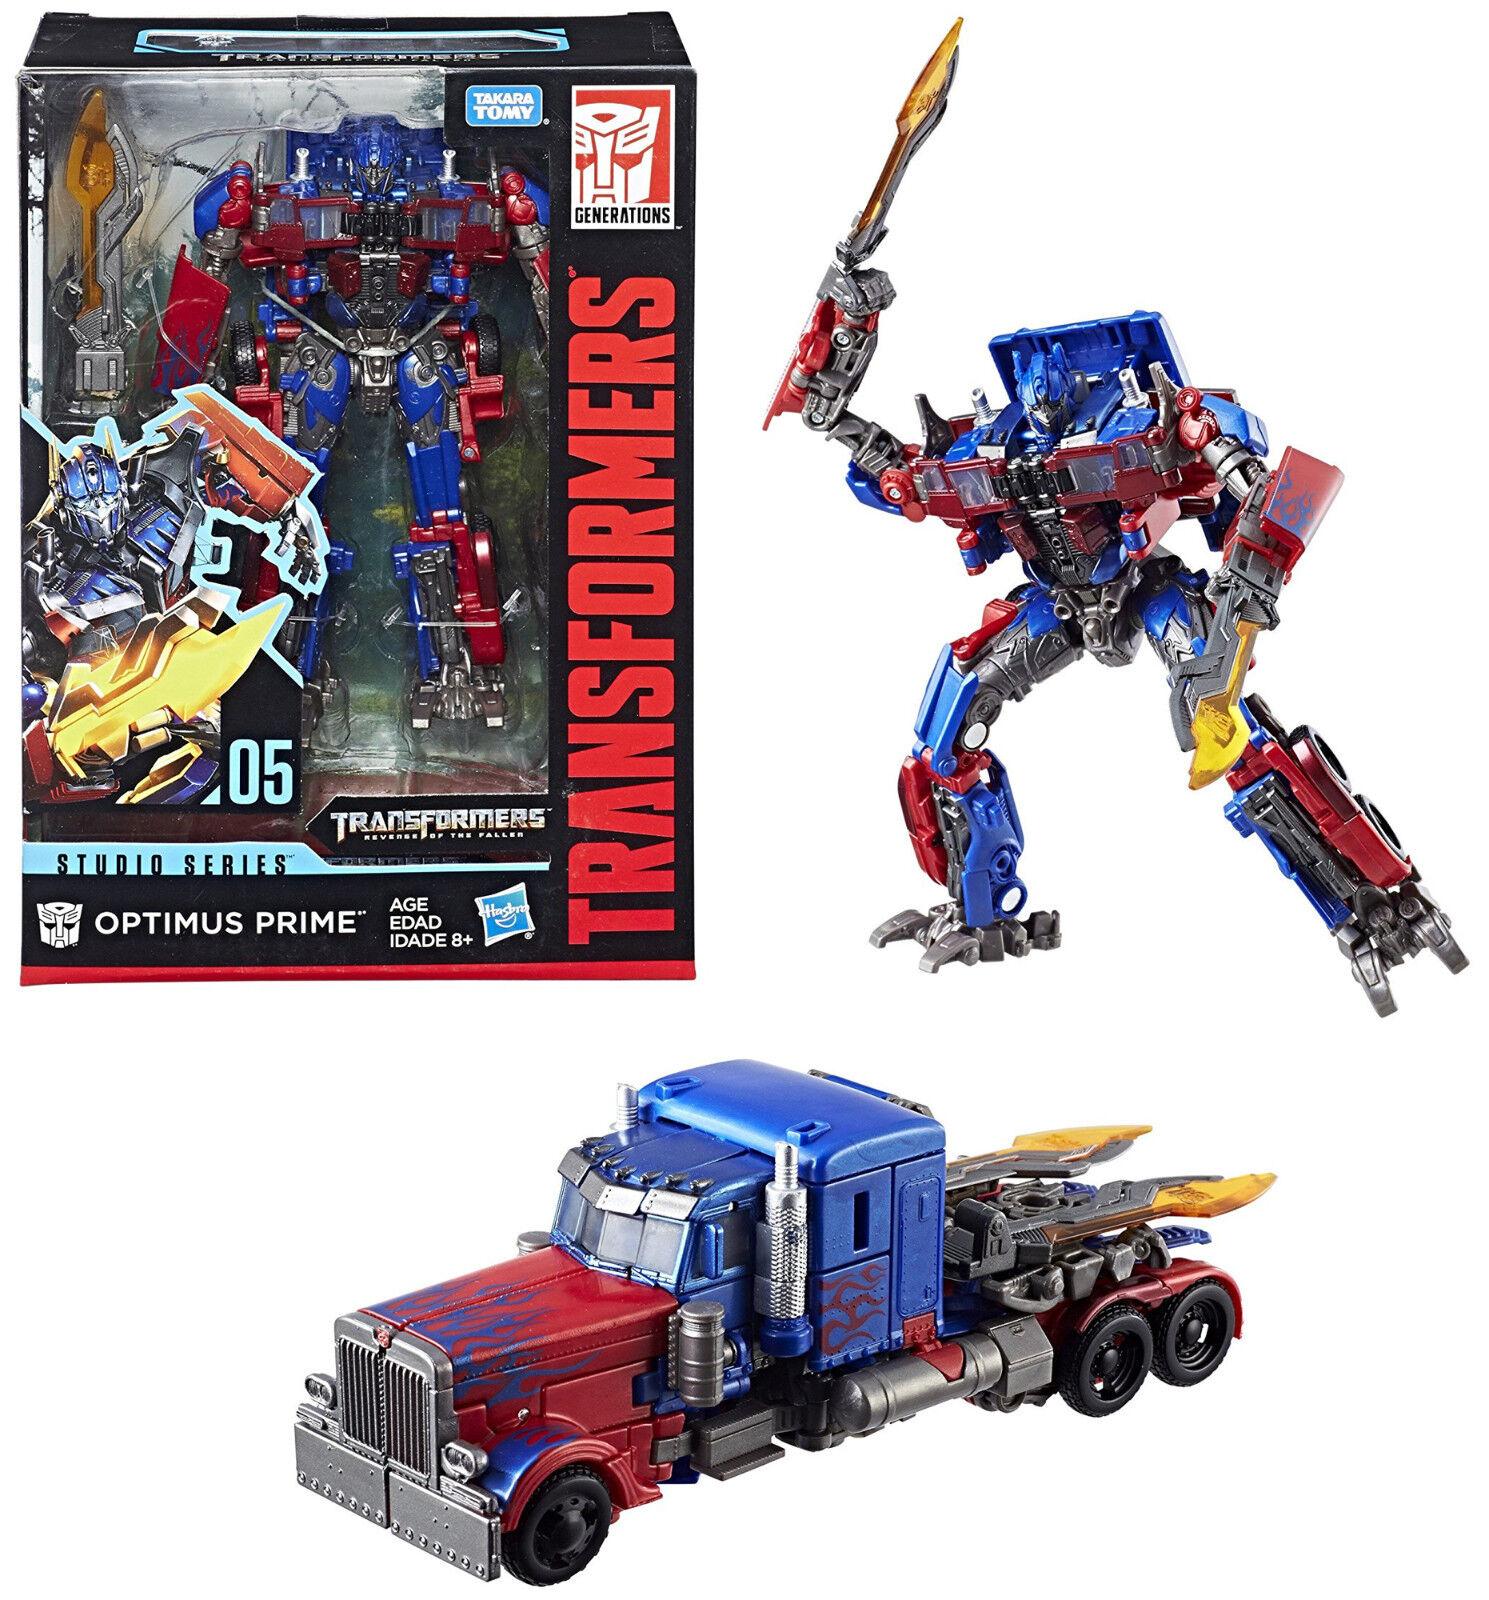 Transformers  Studio Series  Autobot OPTIMUS PRIME () FIGURE  Voyager Class